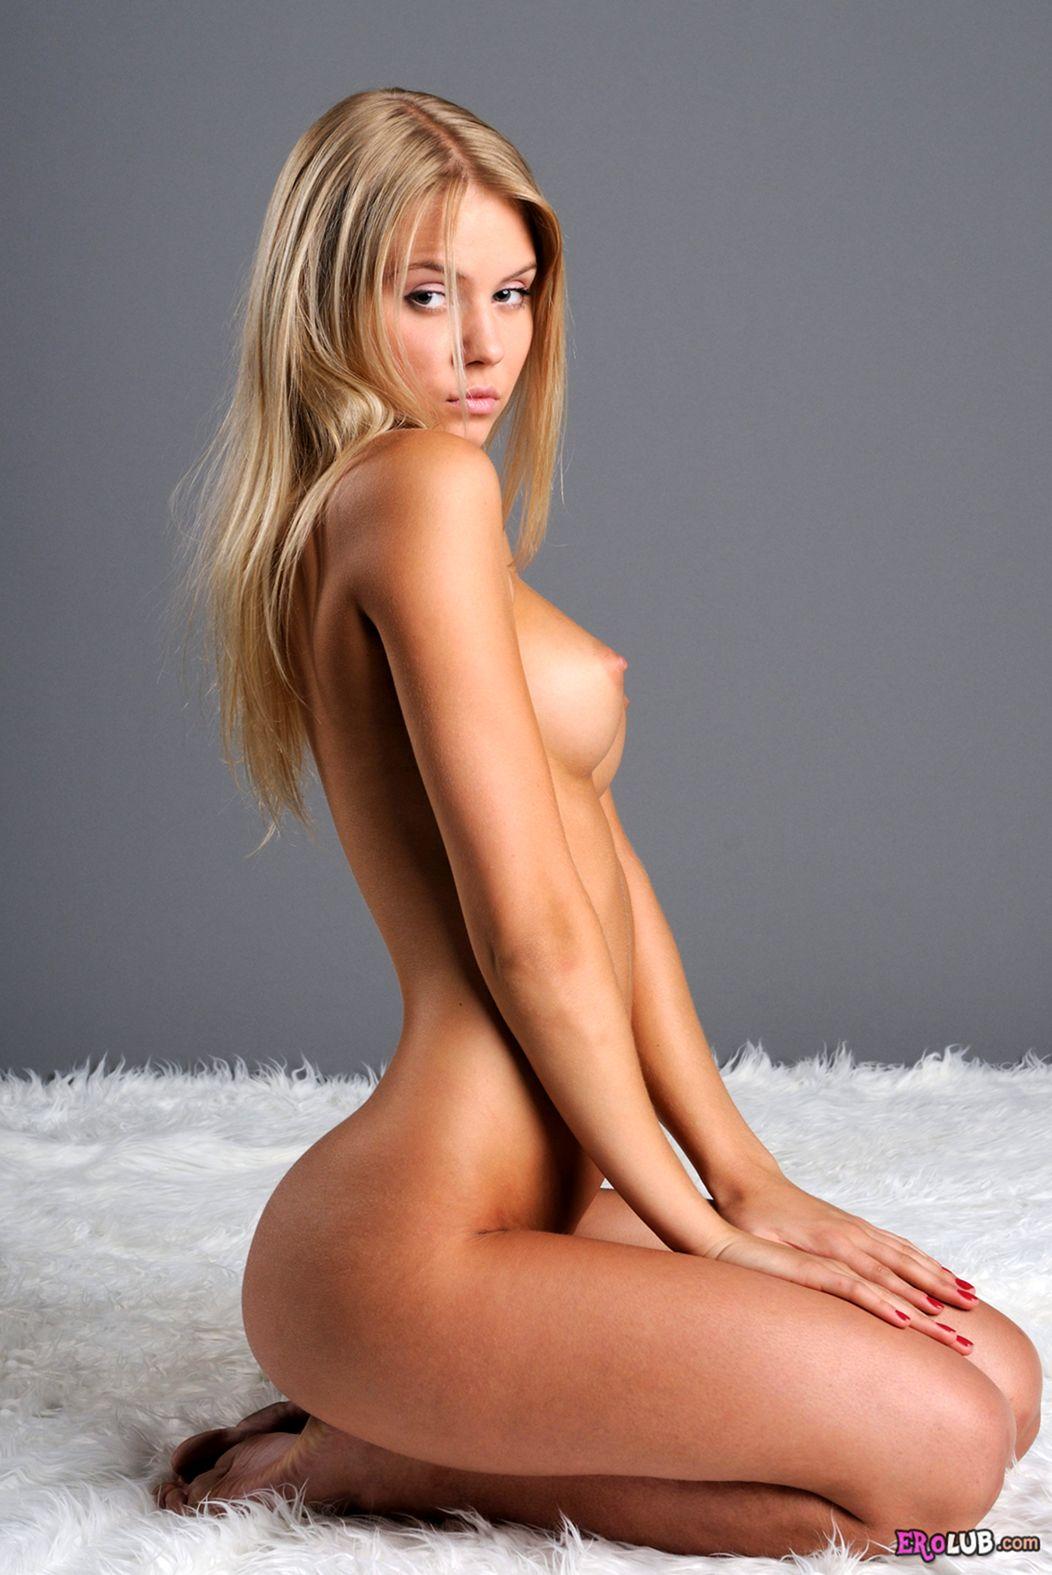 Сайт порно молодой красавицы 26 фотография